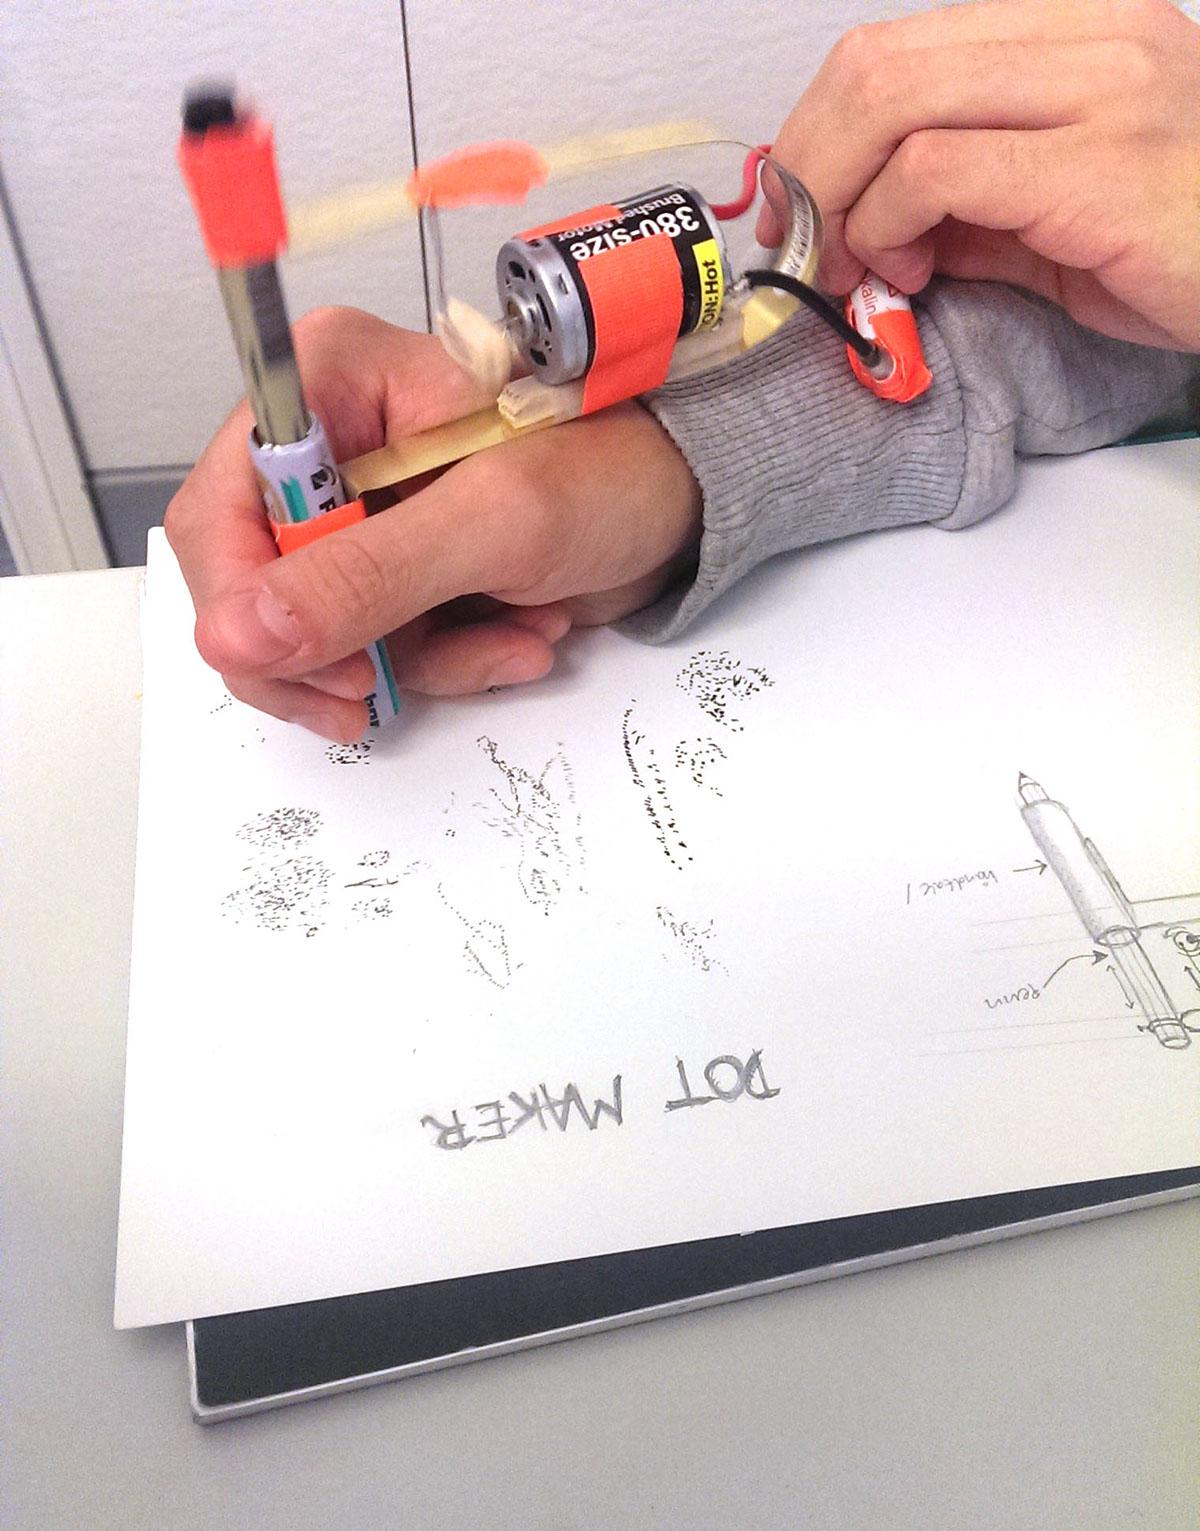 dots maker stippling stipple machine DIY prototype Drawing